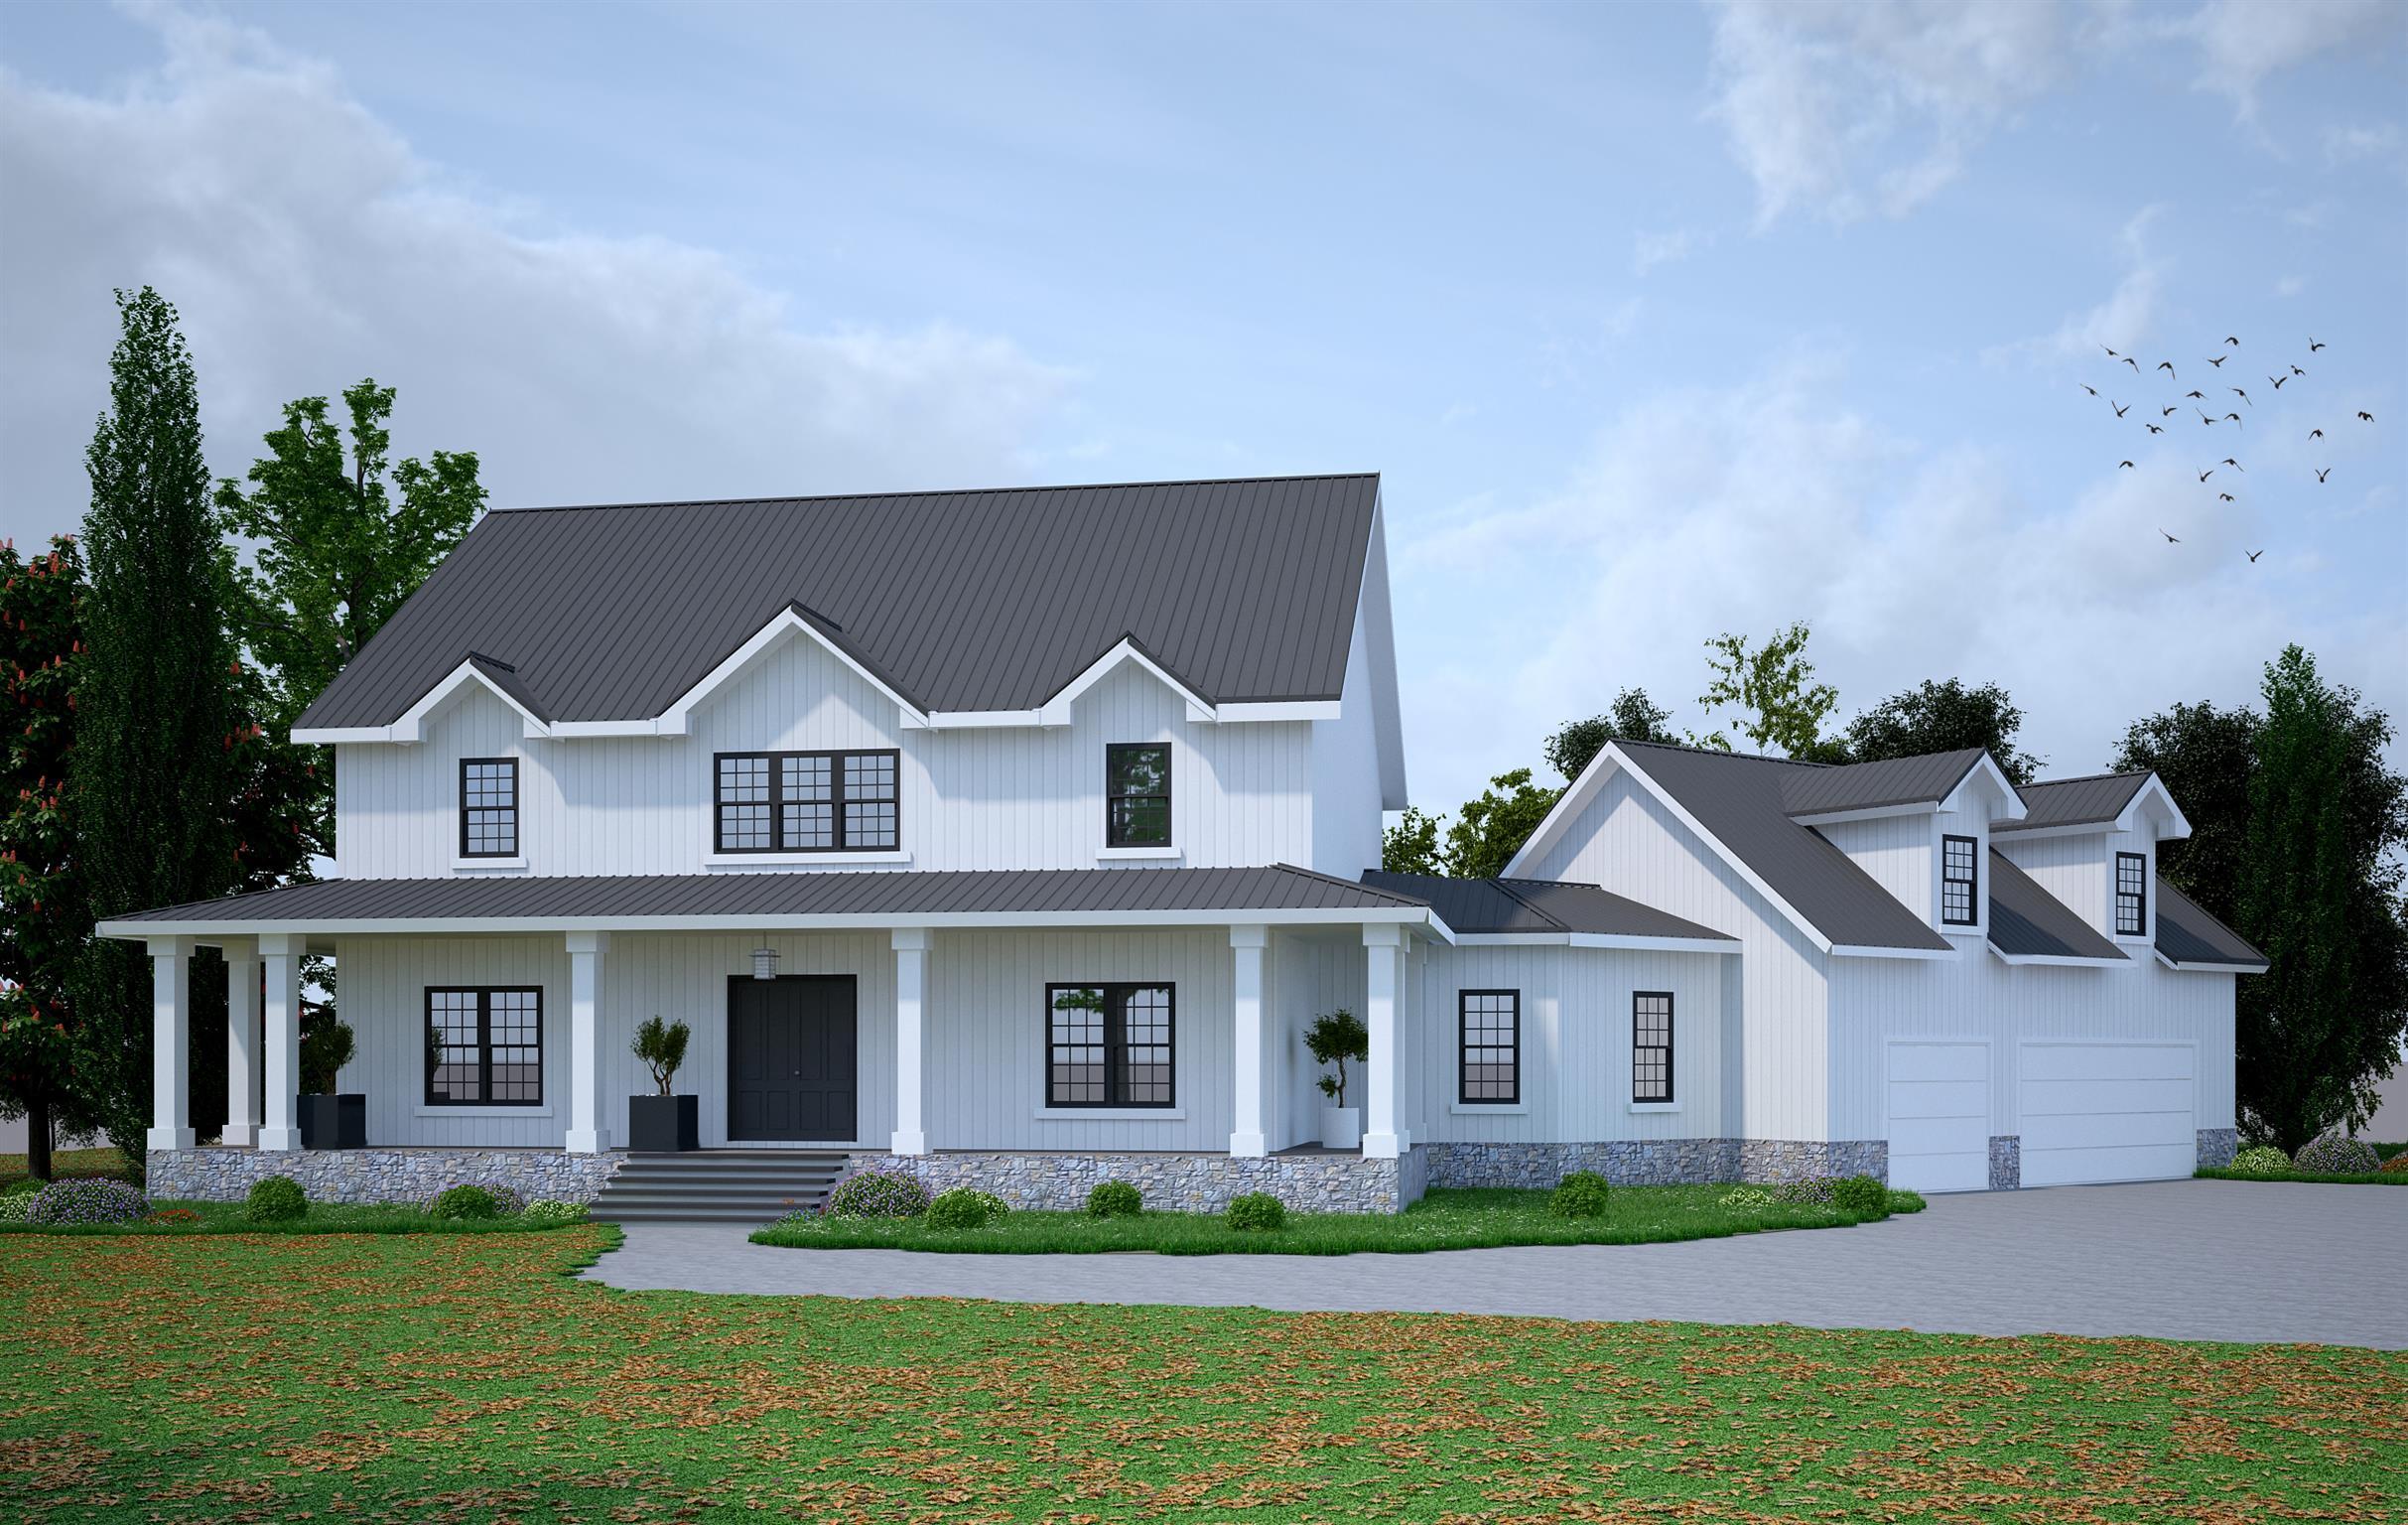 2274 Lewisburg Pike, Franklin, TN 37064 - Franklin, TN real estate listing